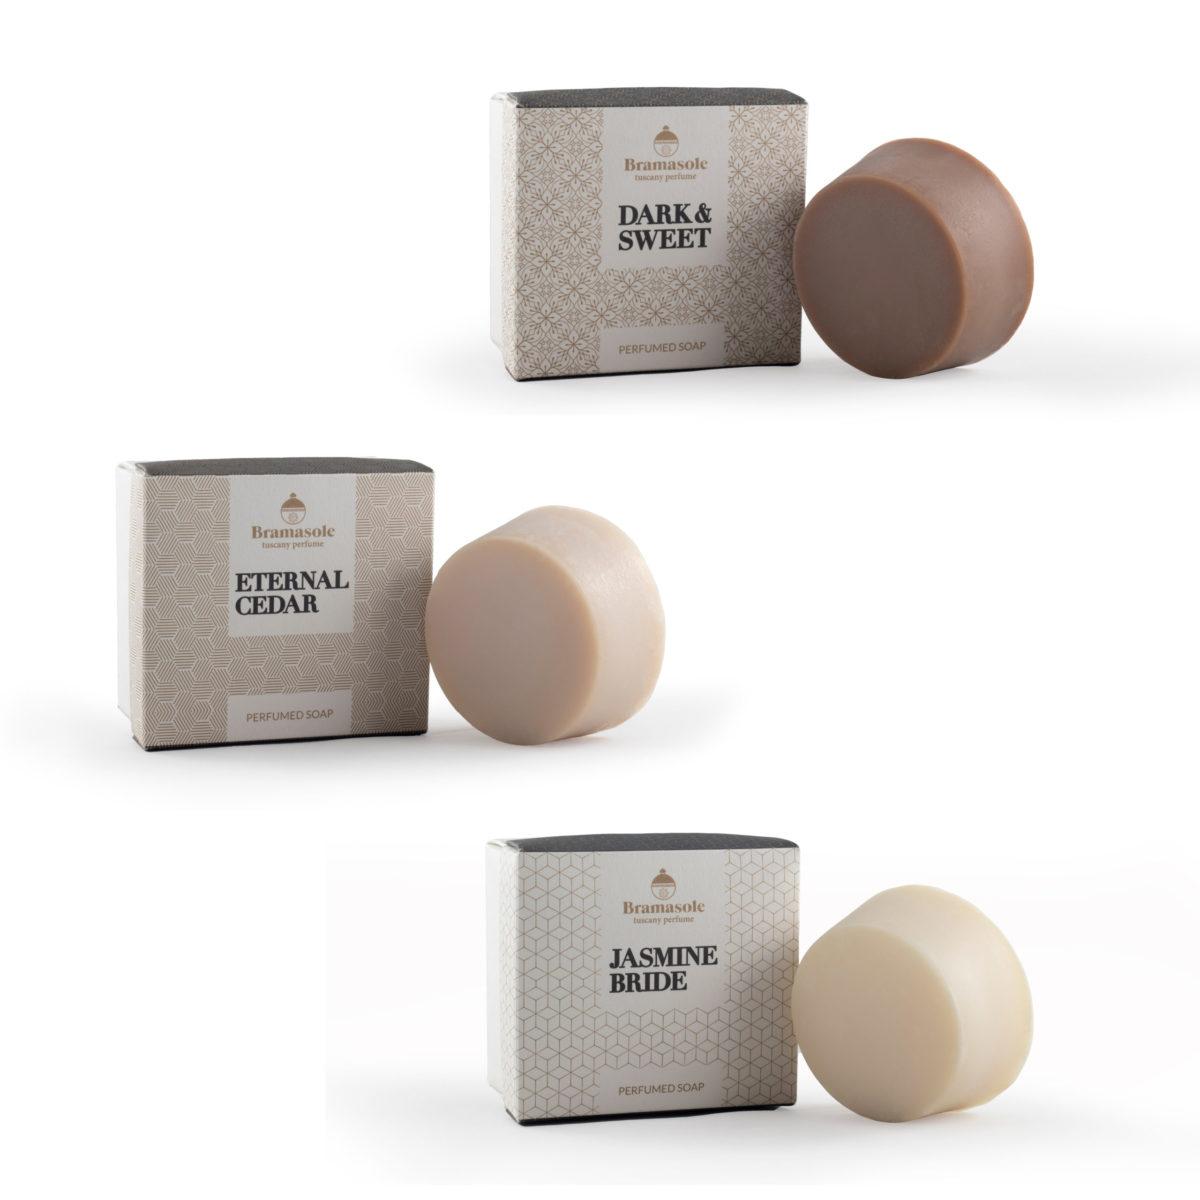 Soap set with Eternal Cedar, Dark e Sweet, Jasmine Bride